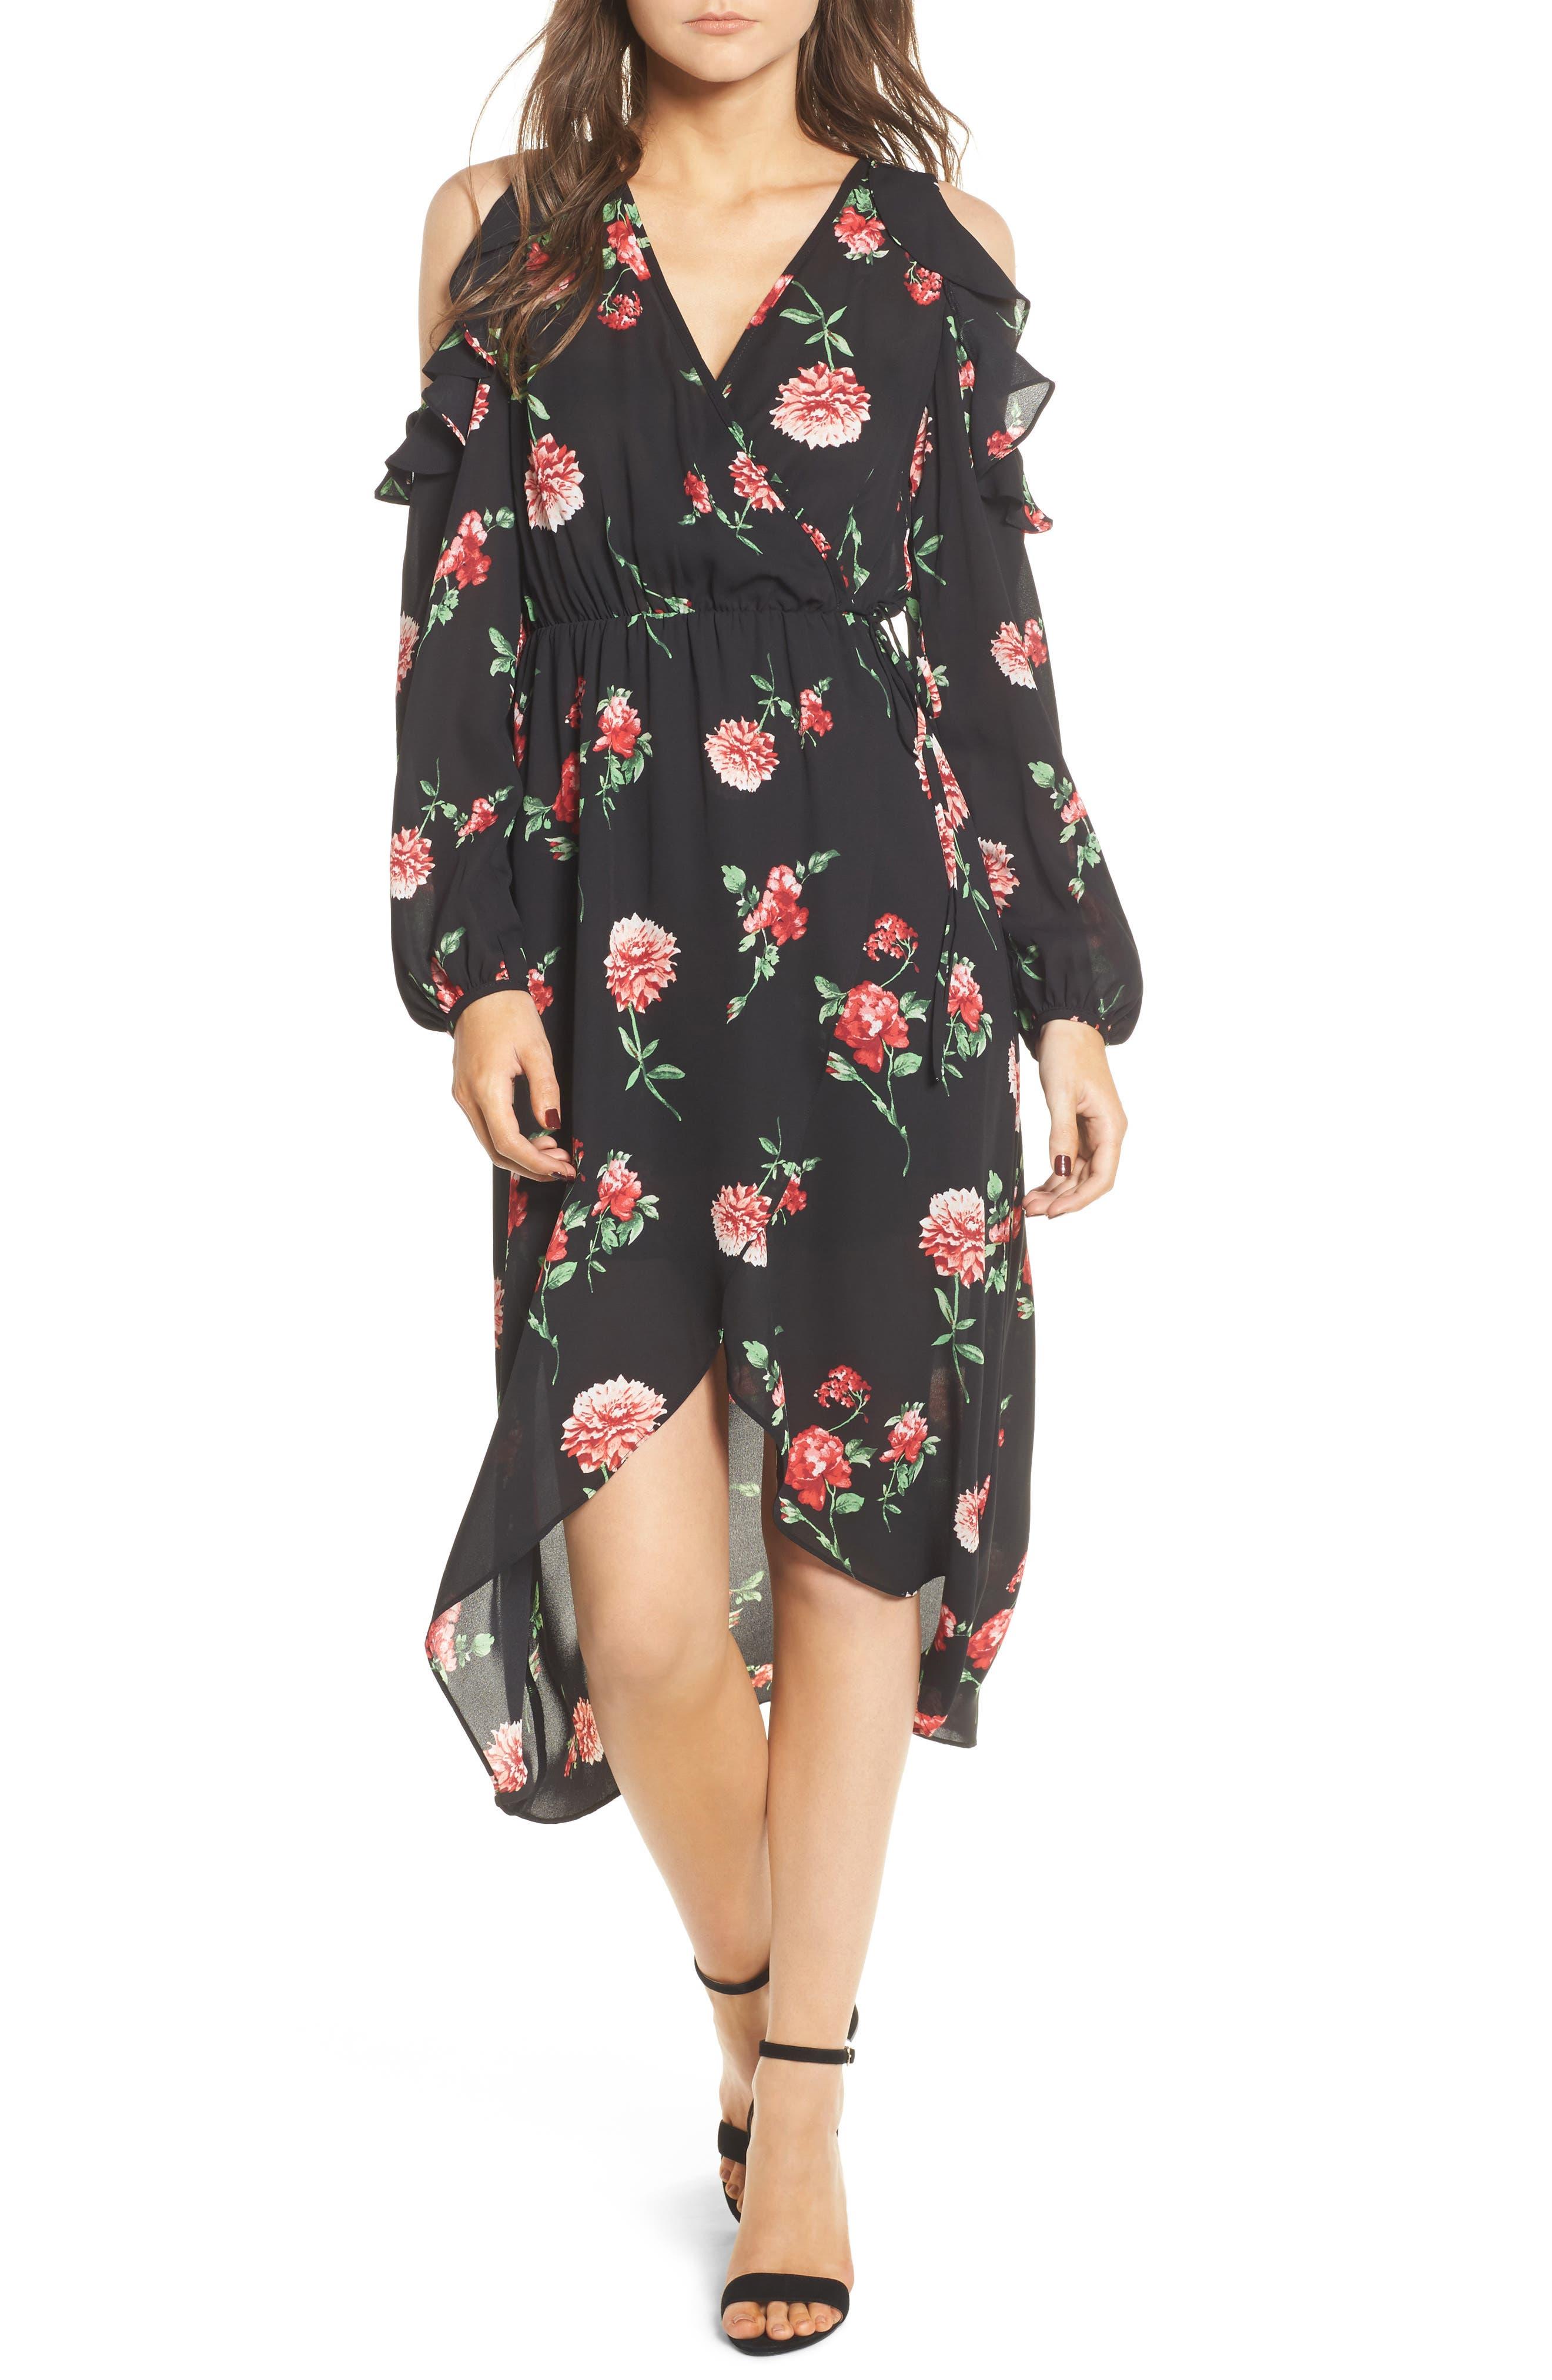 Ruffle Cold Shoulder Faux Wrap Dress,                             Main thumbnail 1, color,                             750 Black Red